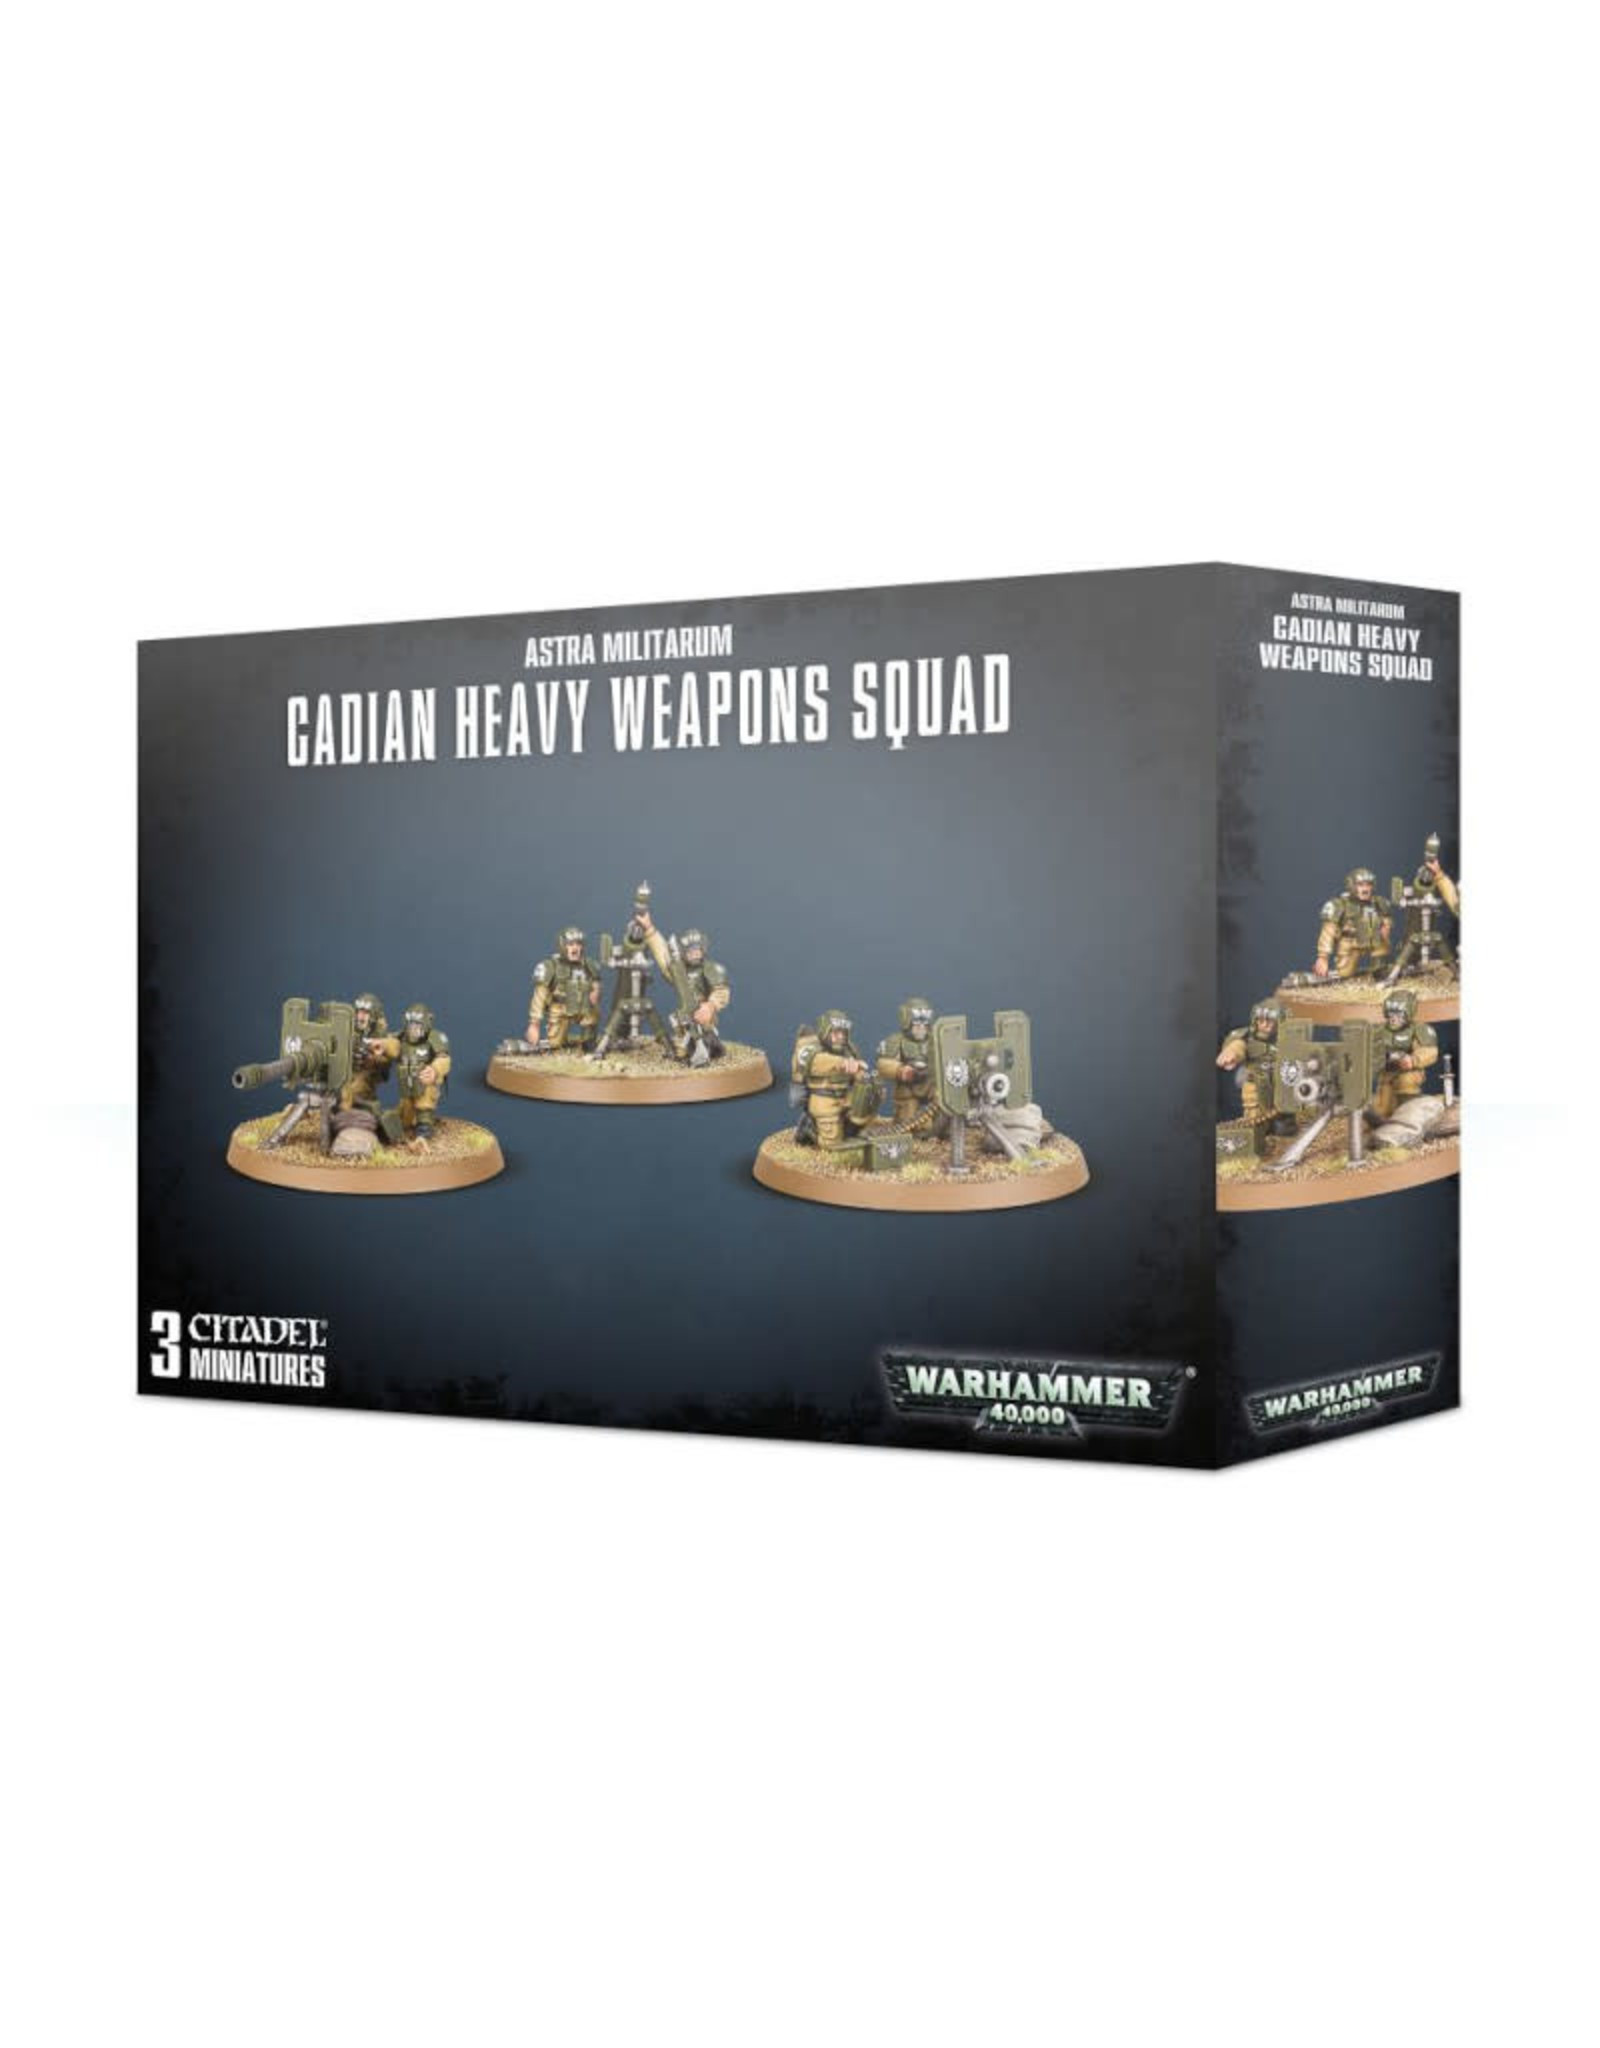 Games Workshop Warhammer 40K Astra Militarum Cadian Heavy Weapon Squad